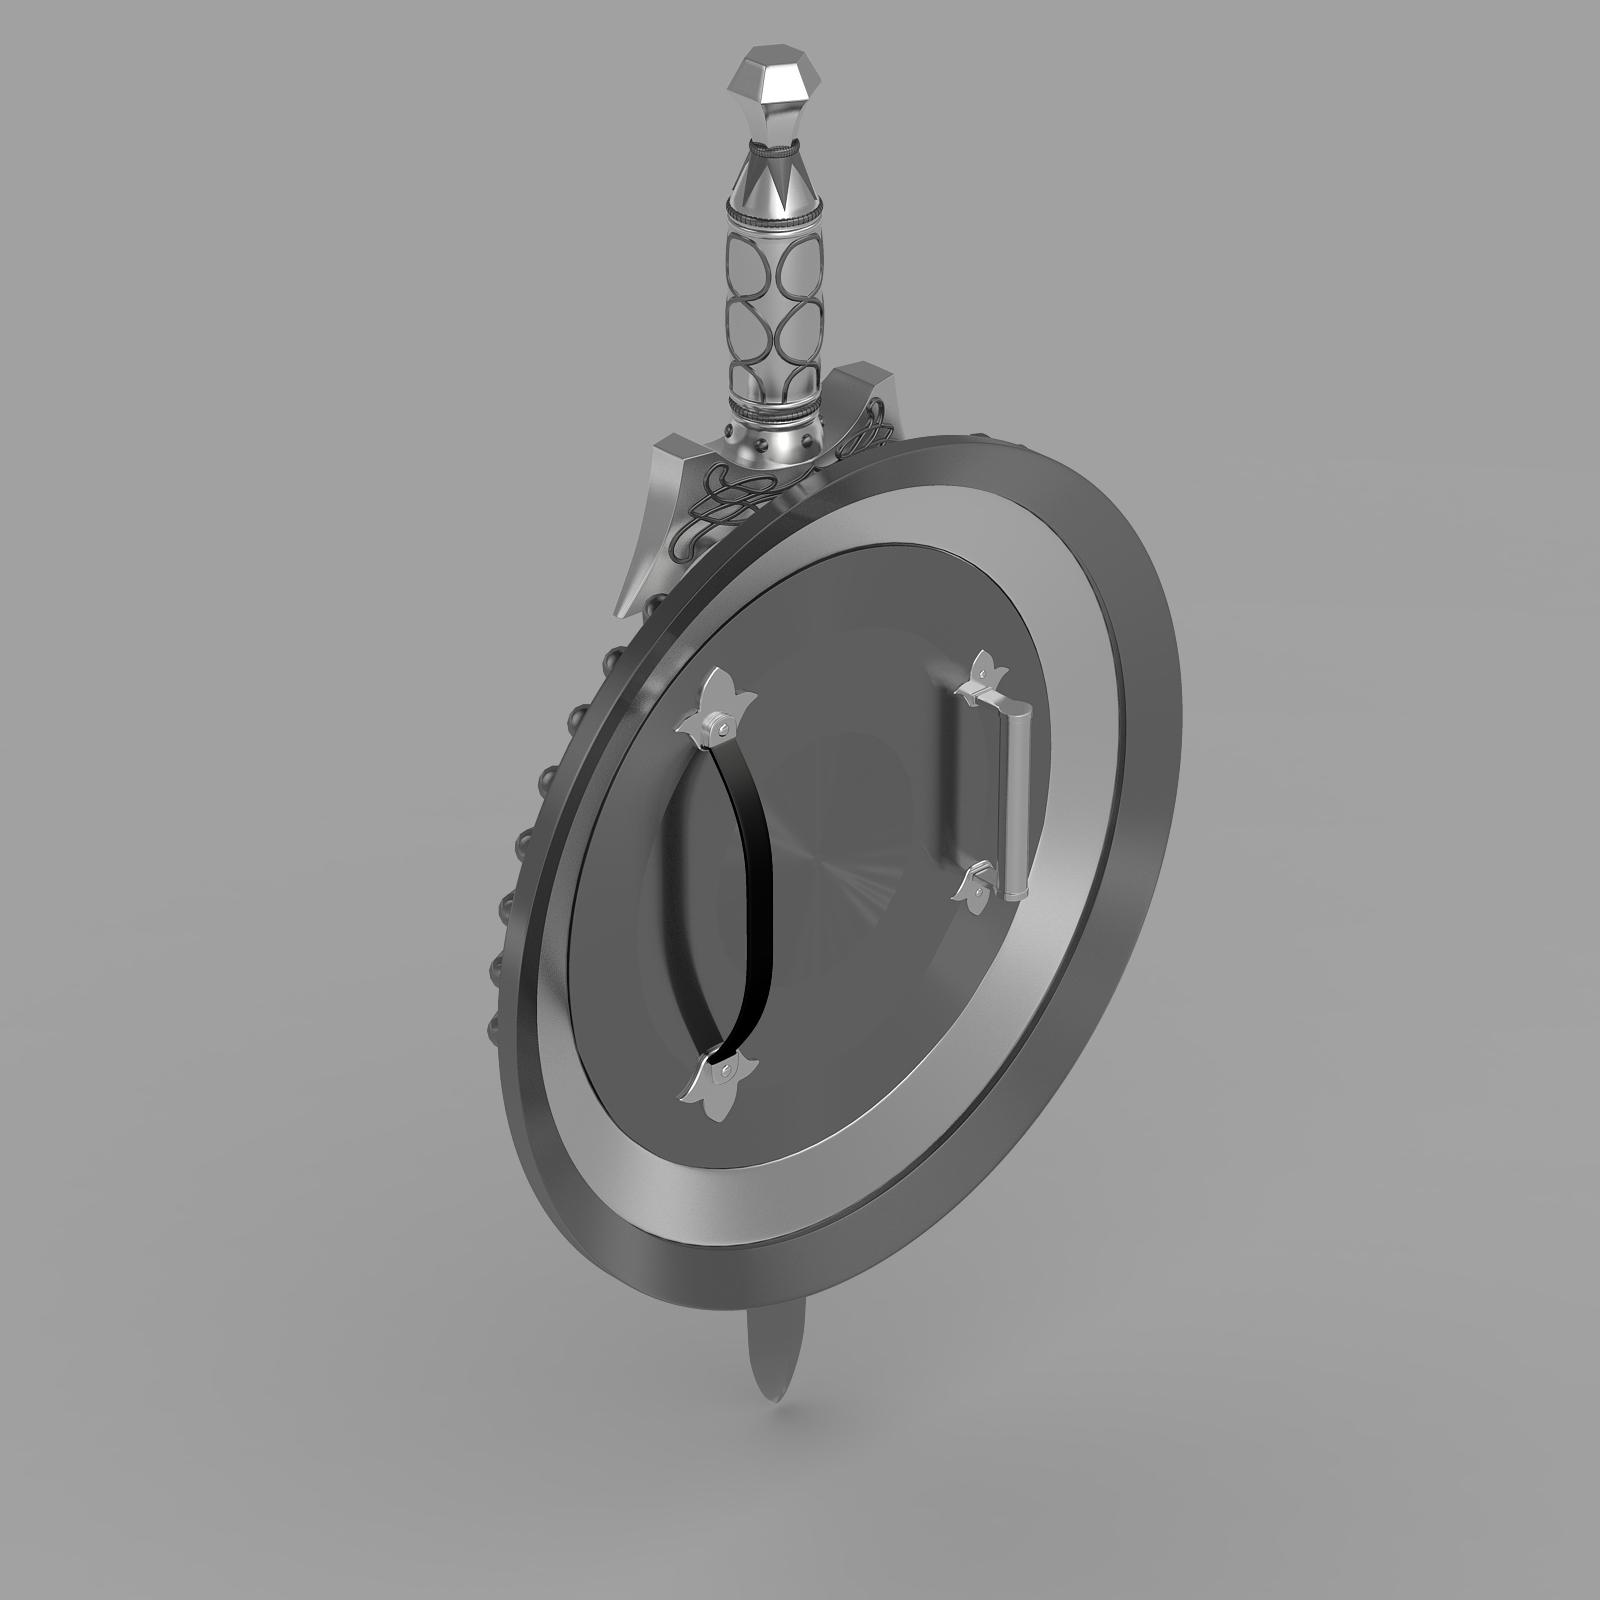 shield and sword v1 3d model 3ds fbx c4d lwo ma mb hrc xsi  obj 221432